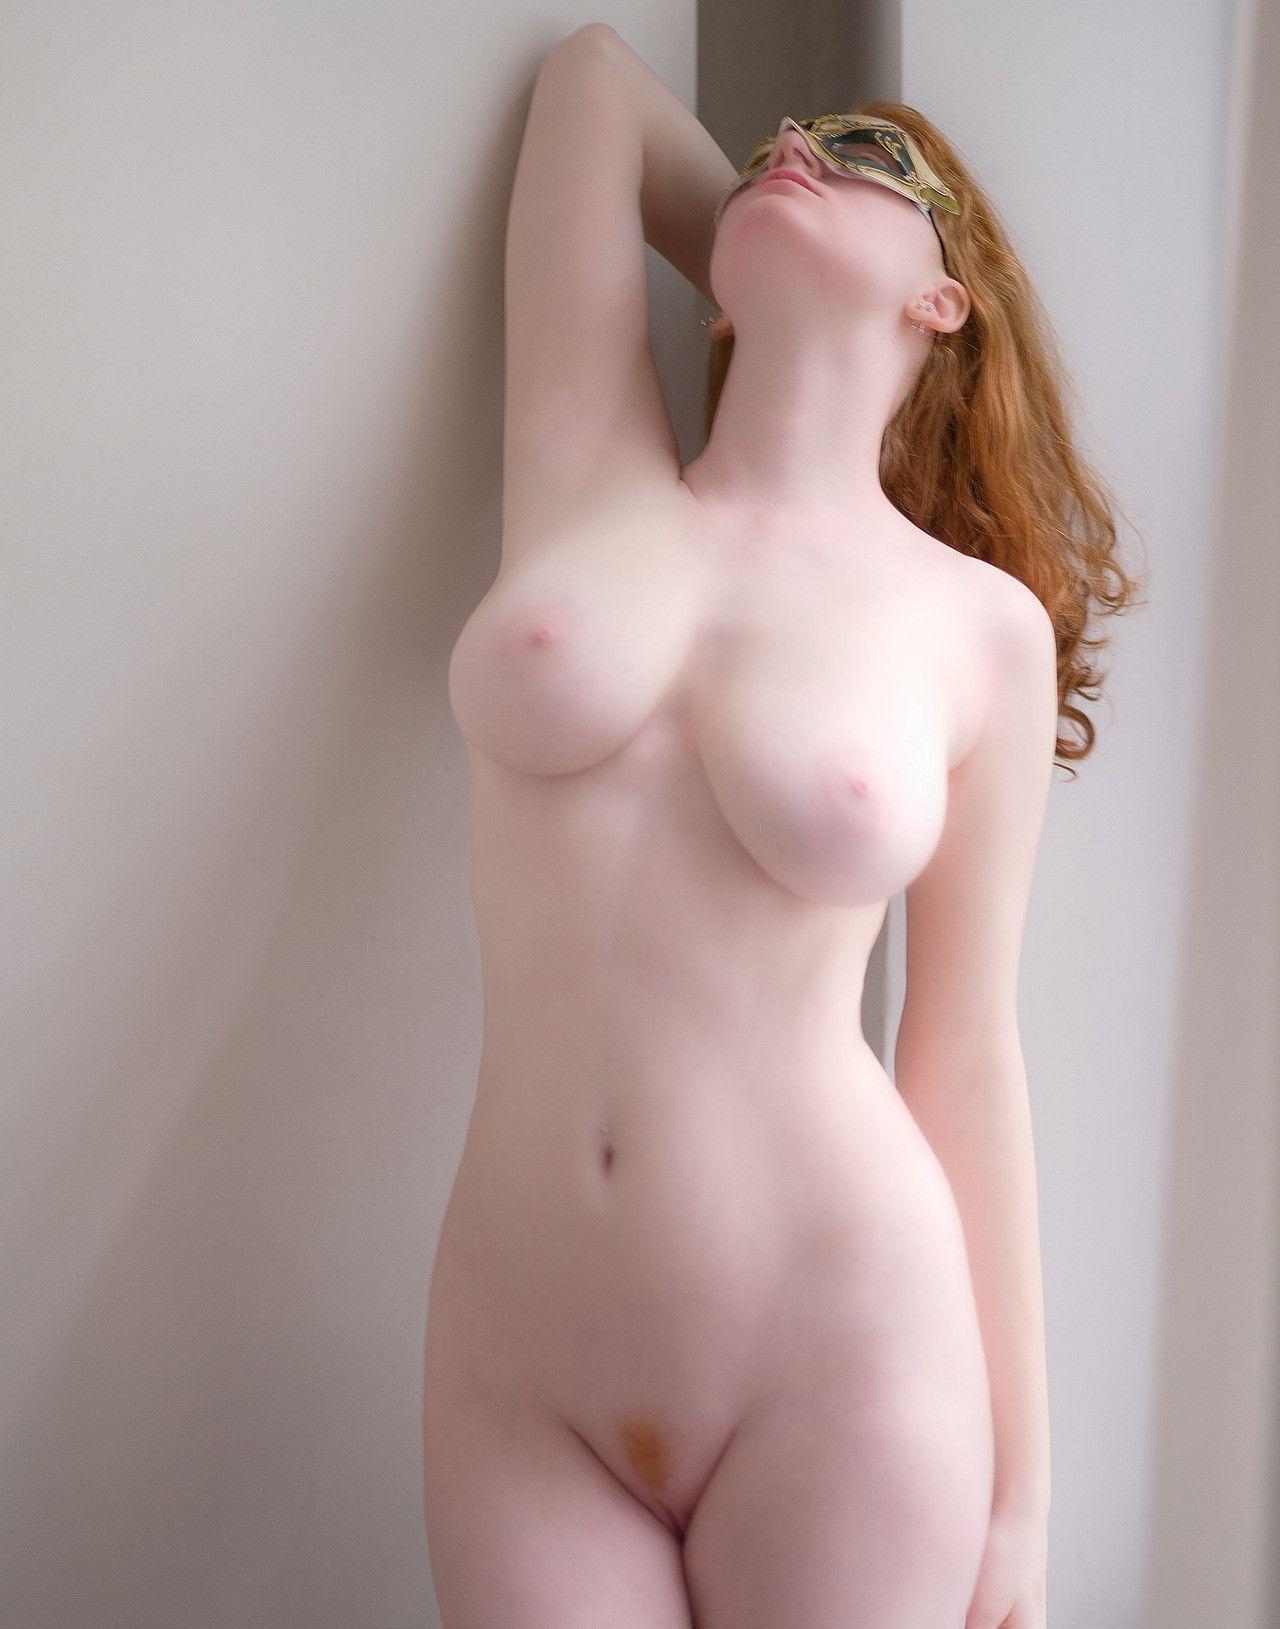 Pale girl naked